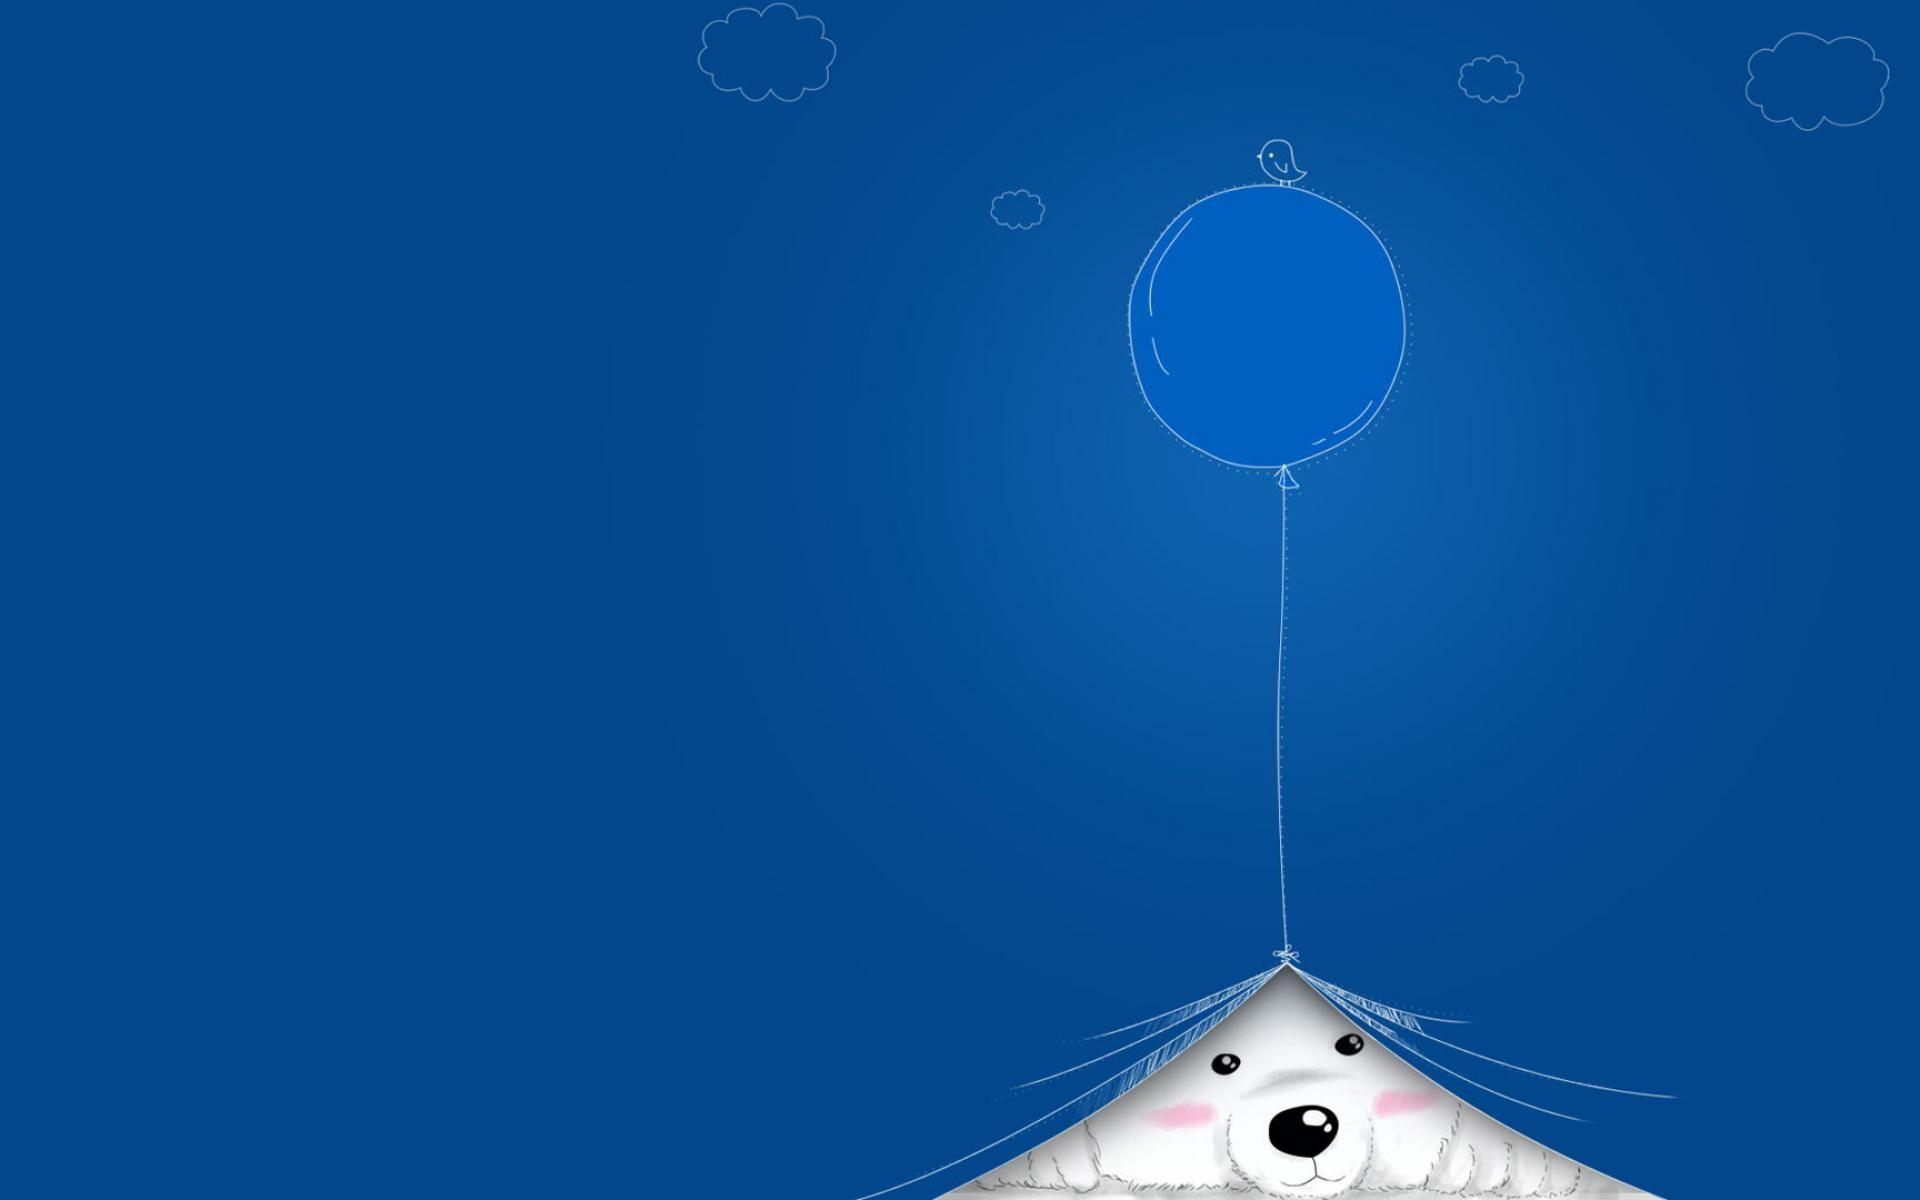 Cute Blue Wallpaper | Download Wallpapers